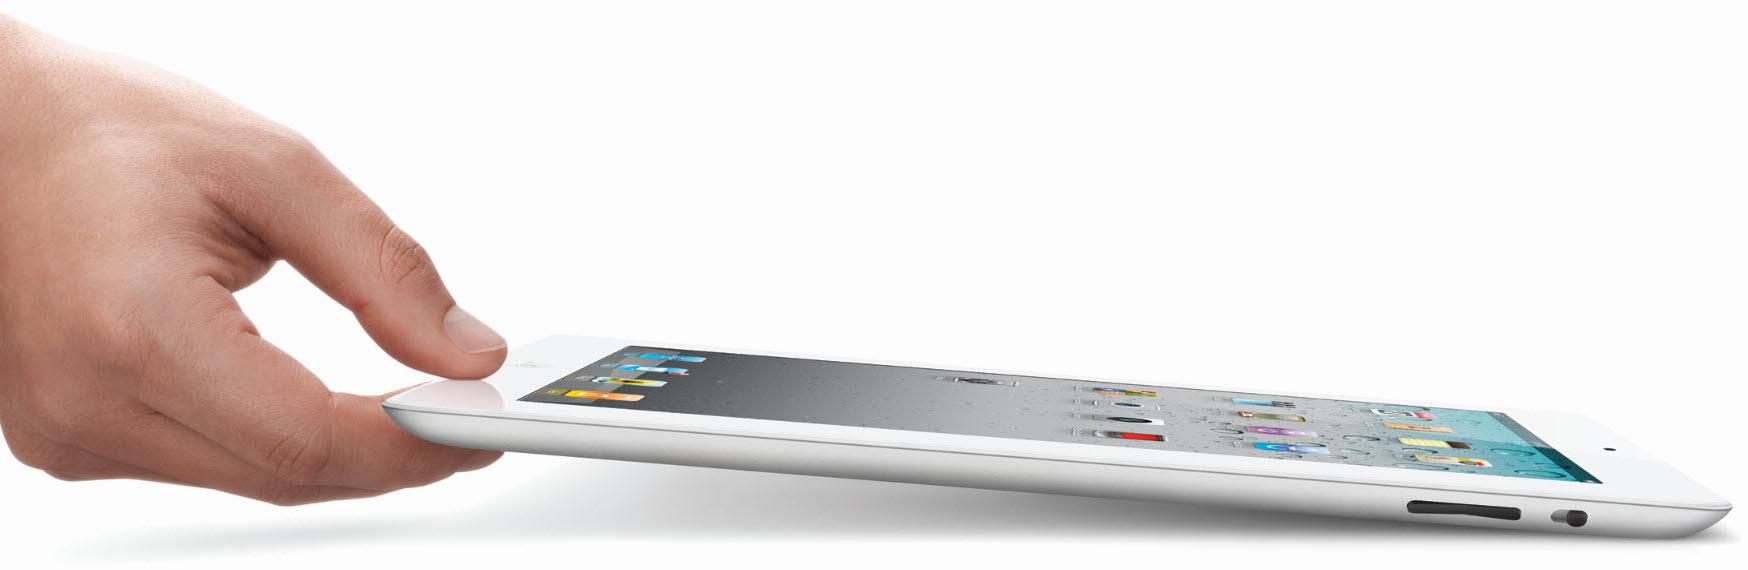 Apple iPad 2 Wi-Fi White  купить в Киеве. Низкая цена.